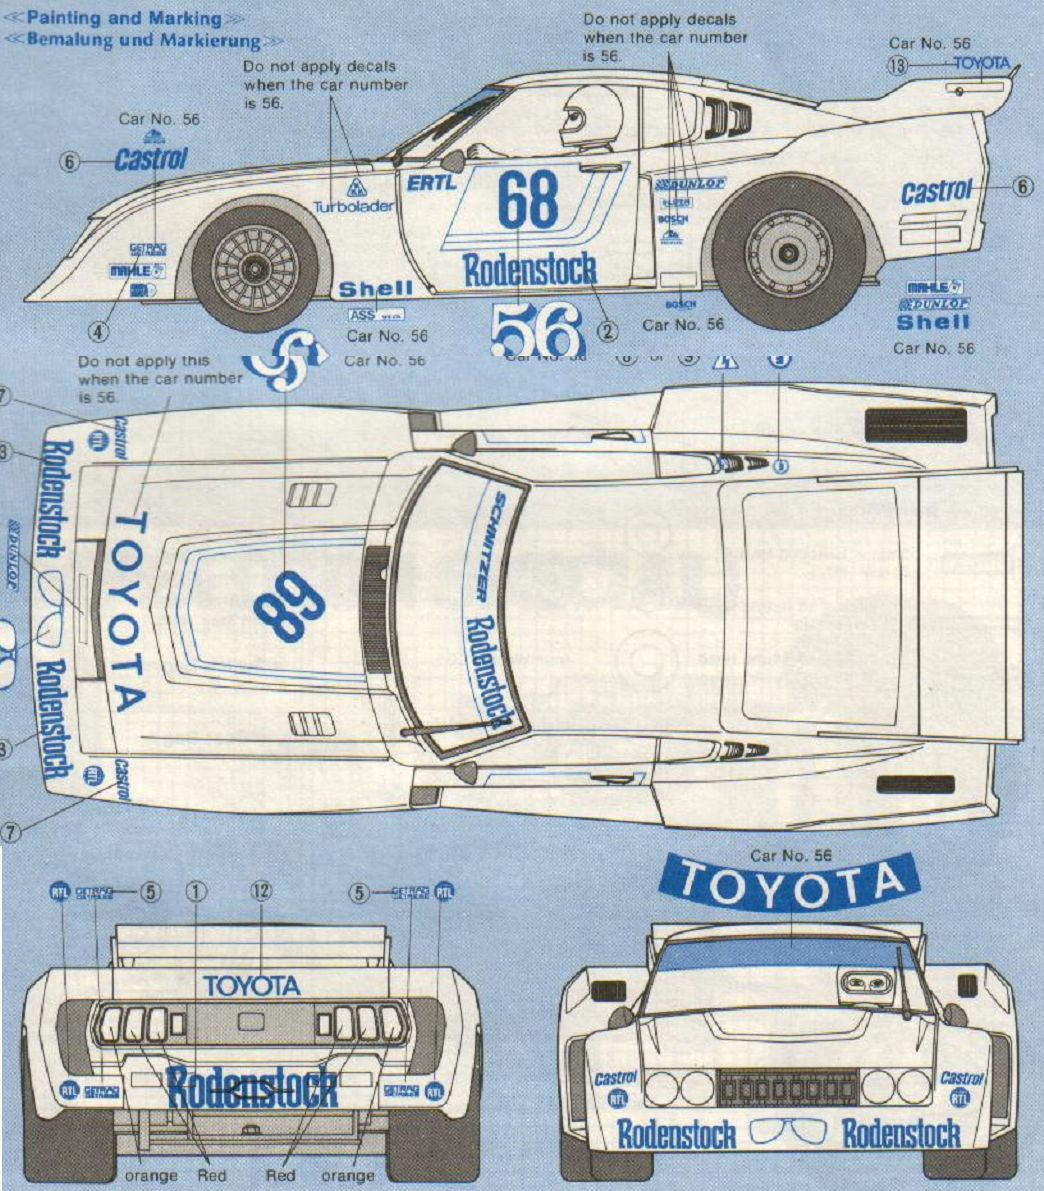 Toyota Celica Lb Turbo Group 5